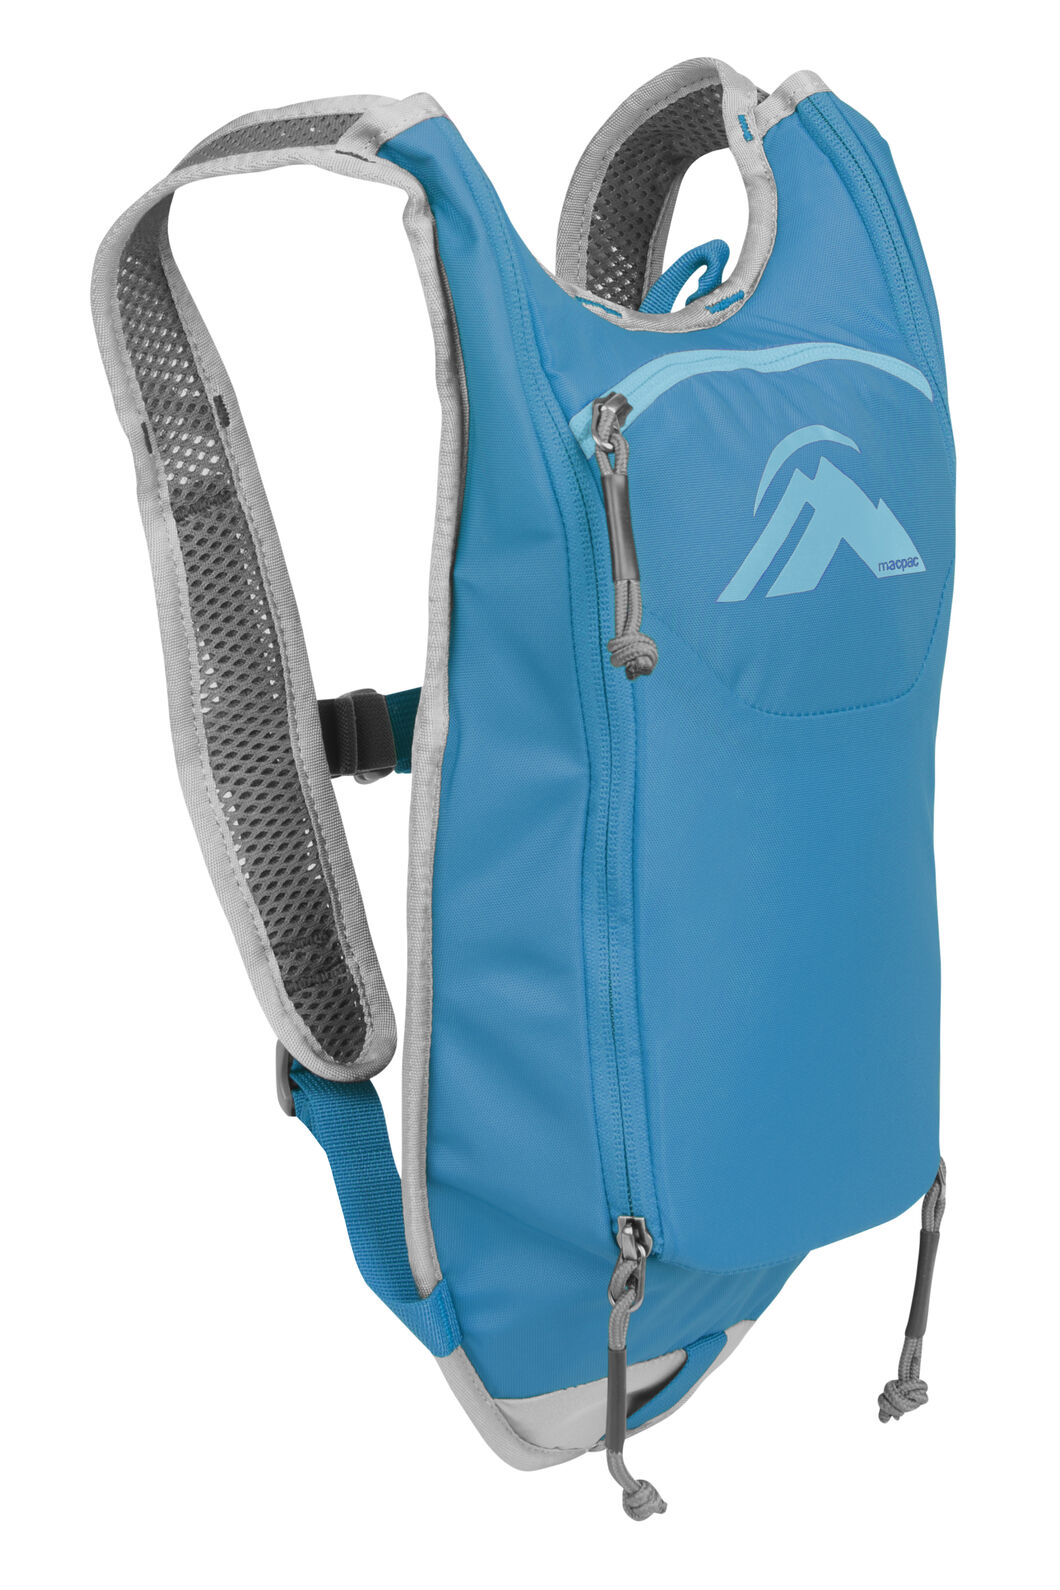 Macpac Milli-Amp H2O 1L Hydration Pack, Enamel Blue, hi-res